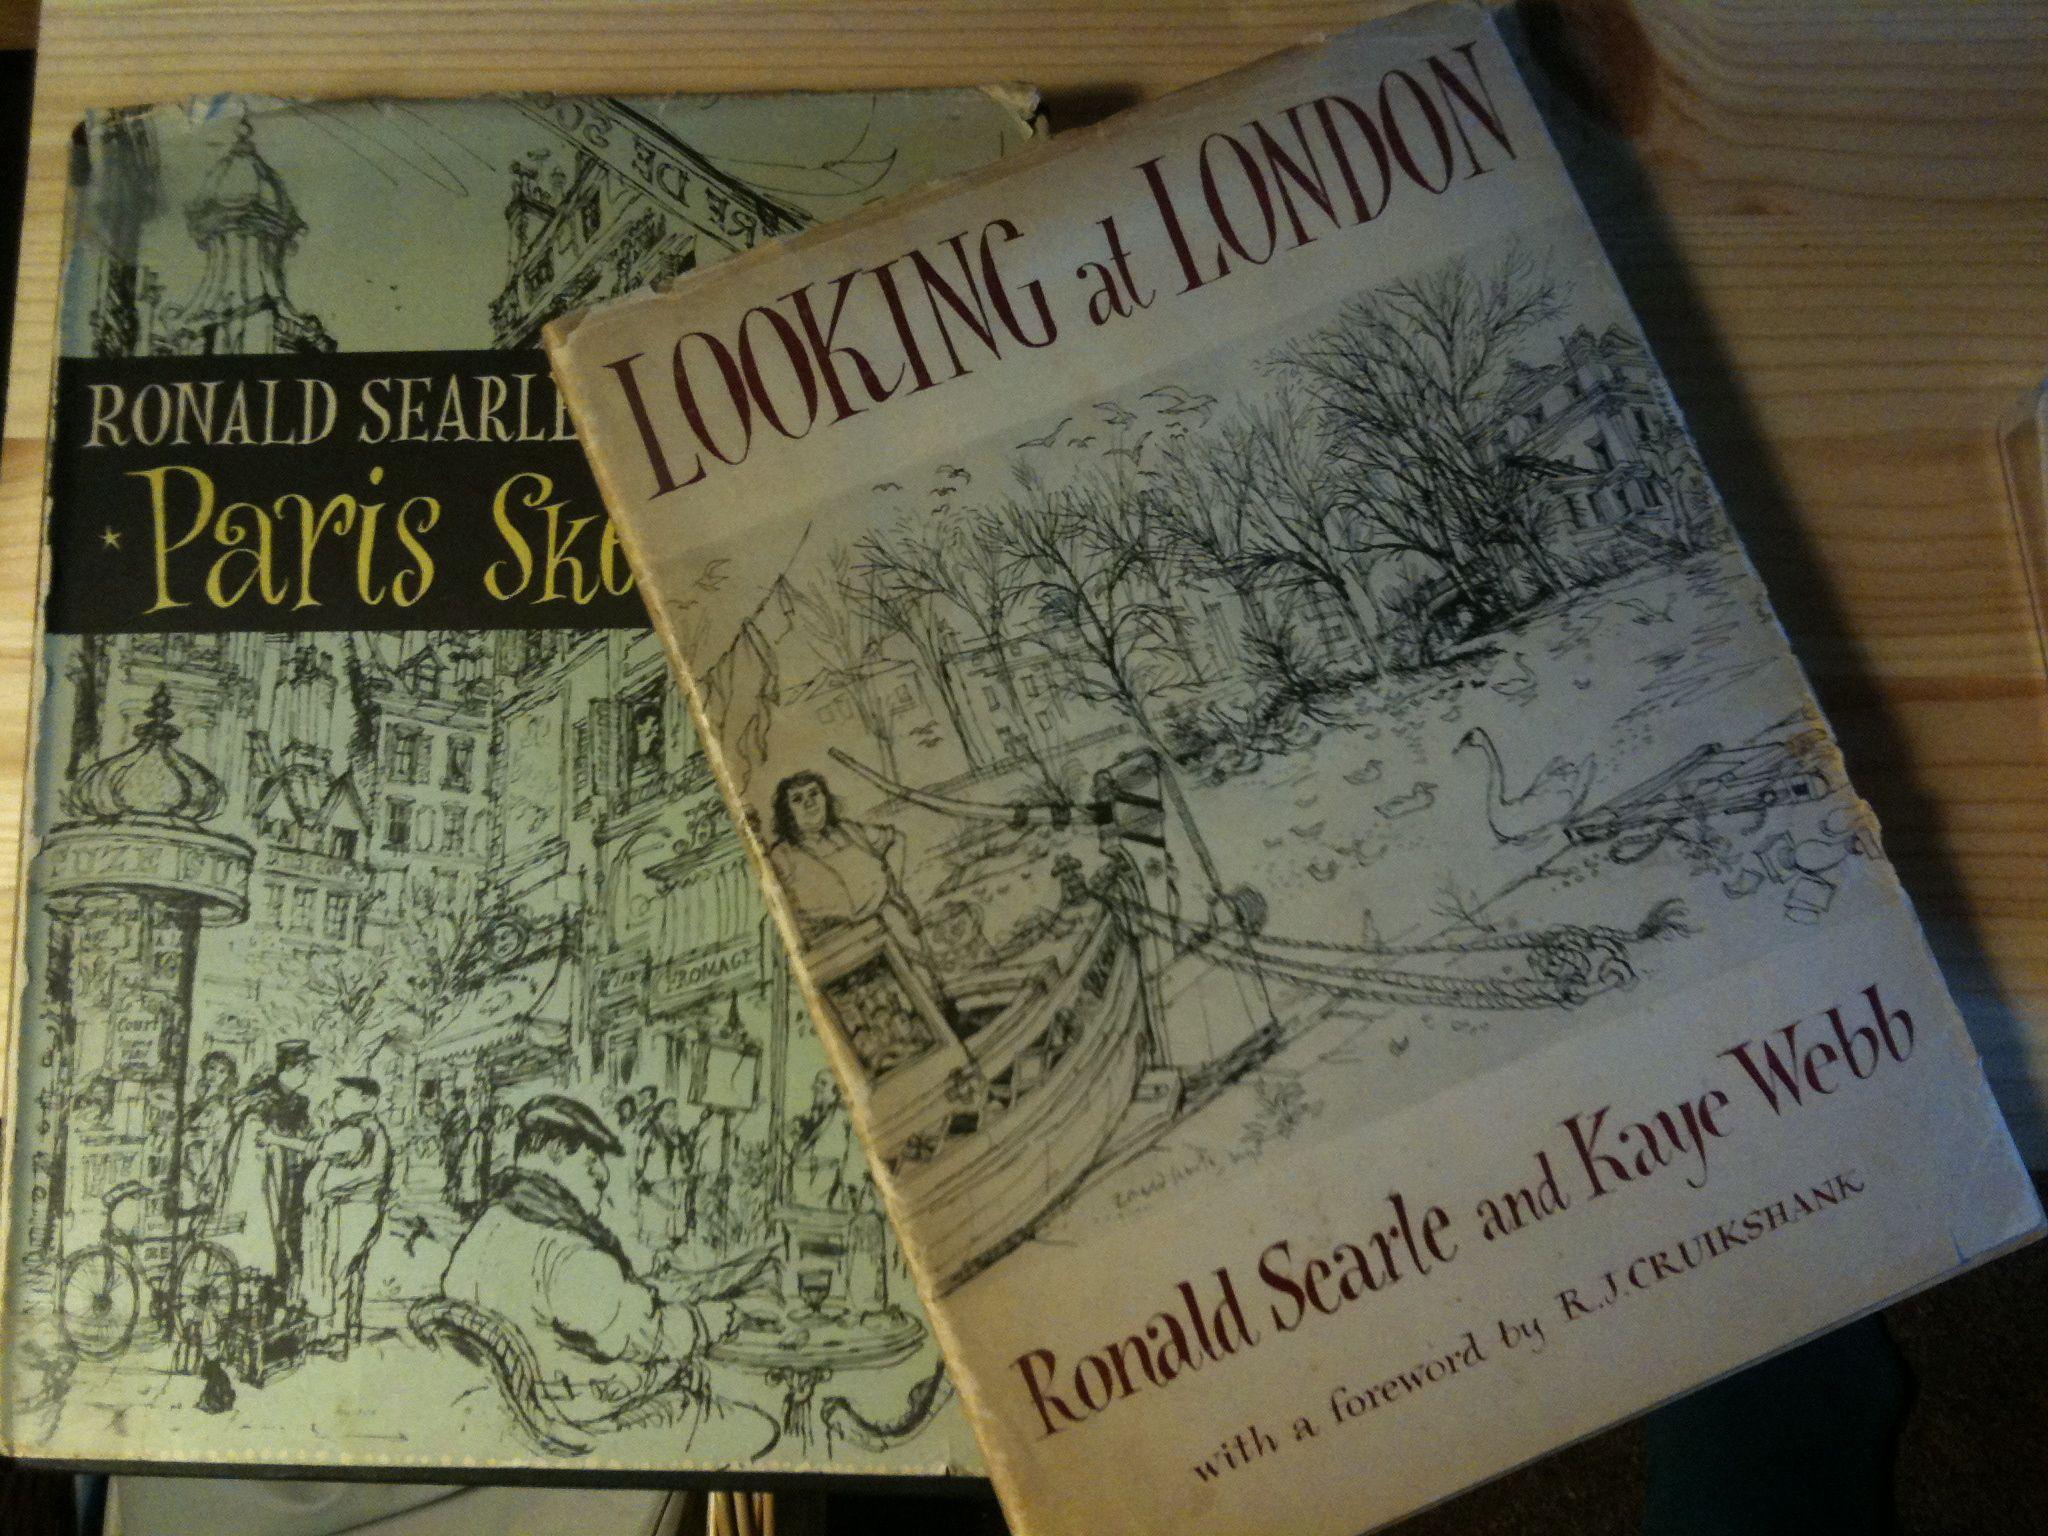 Ronald Searle And Kaye Webb Books